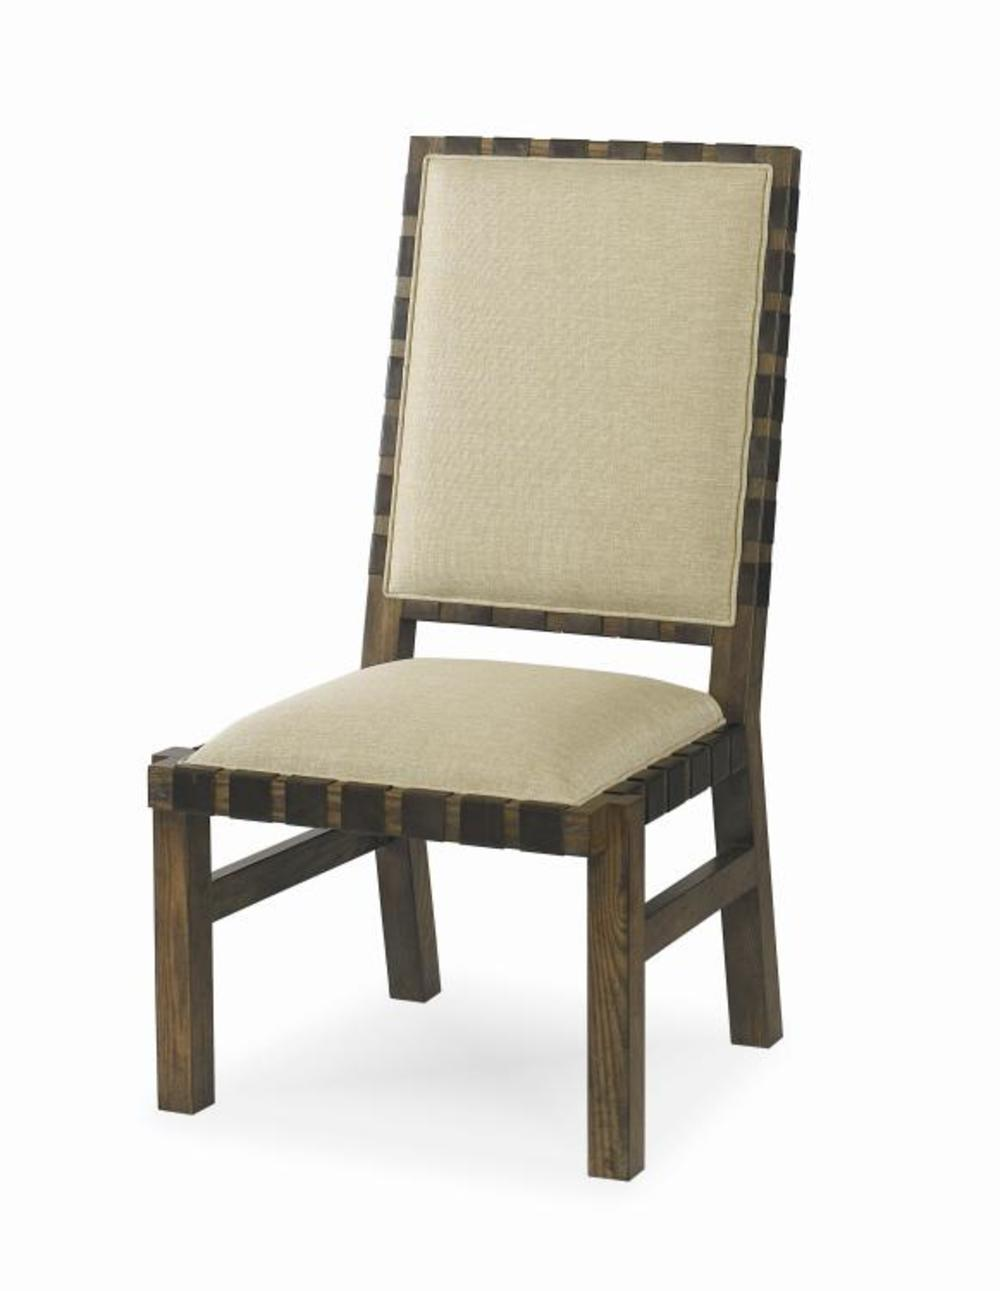 Century Furniture - Sierra Side Chair w/ Trim